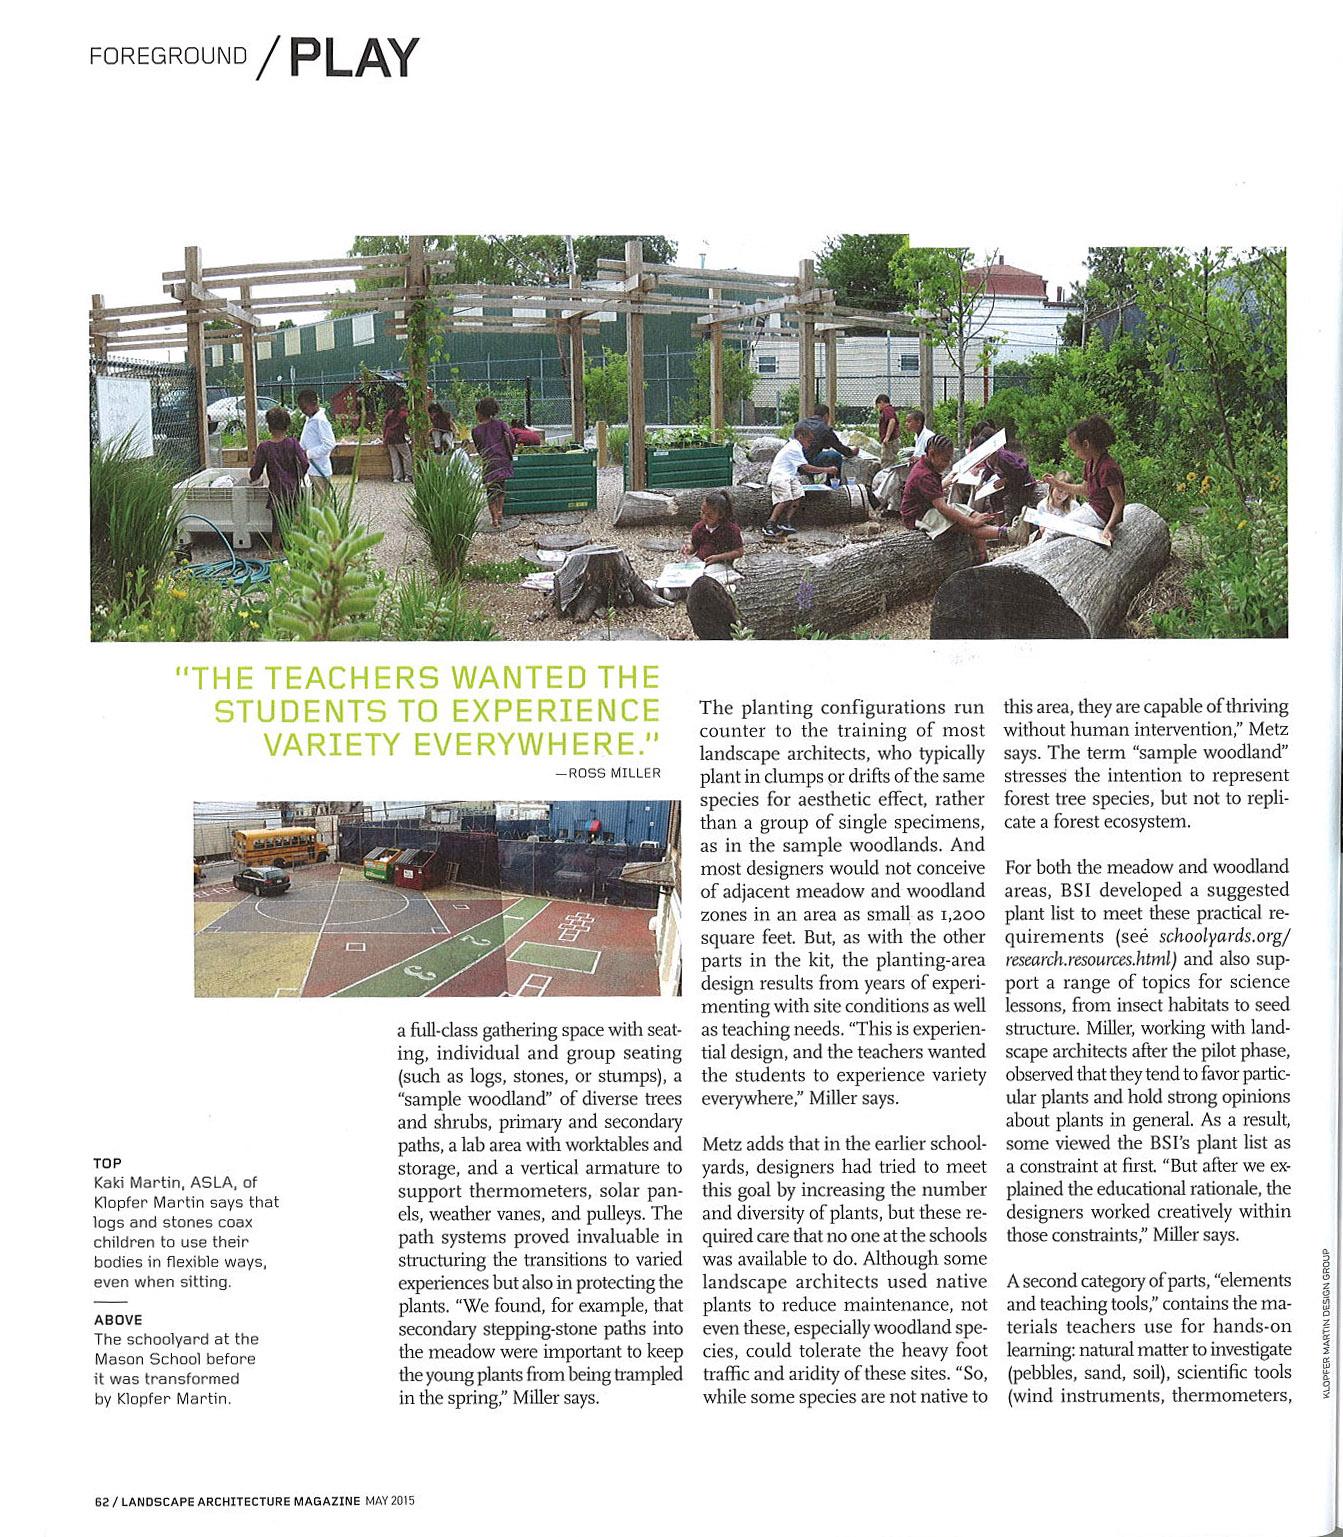 62 klopfer martin landscape architecture magazine.jpg